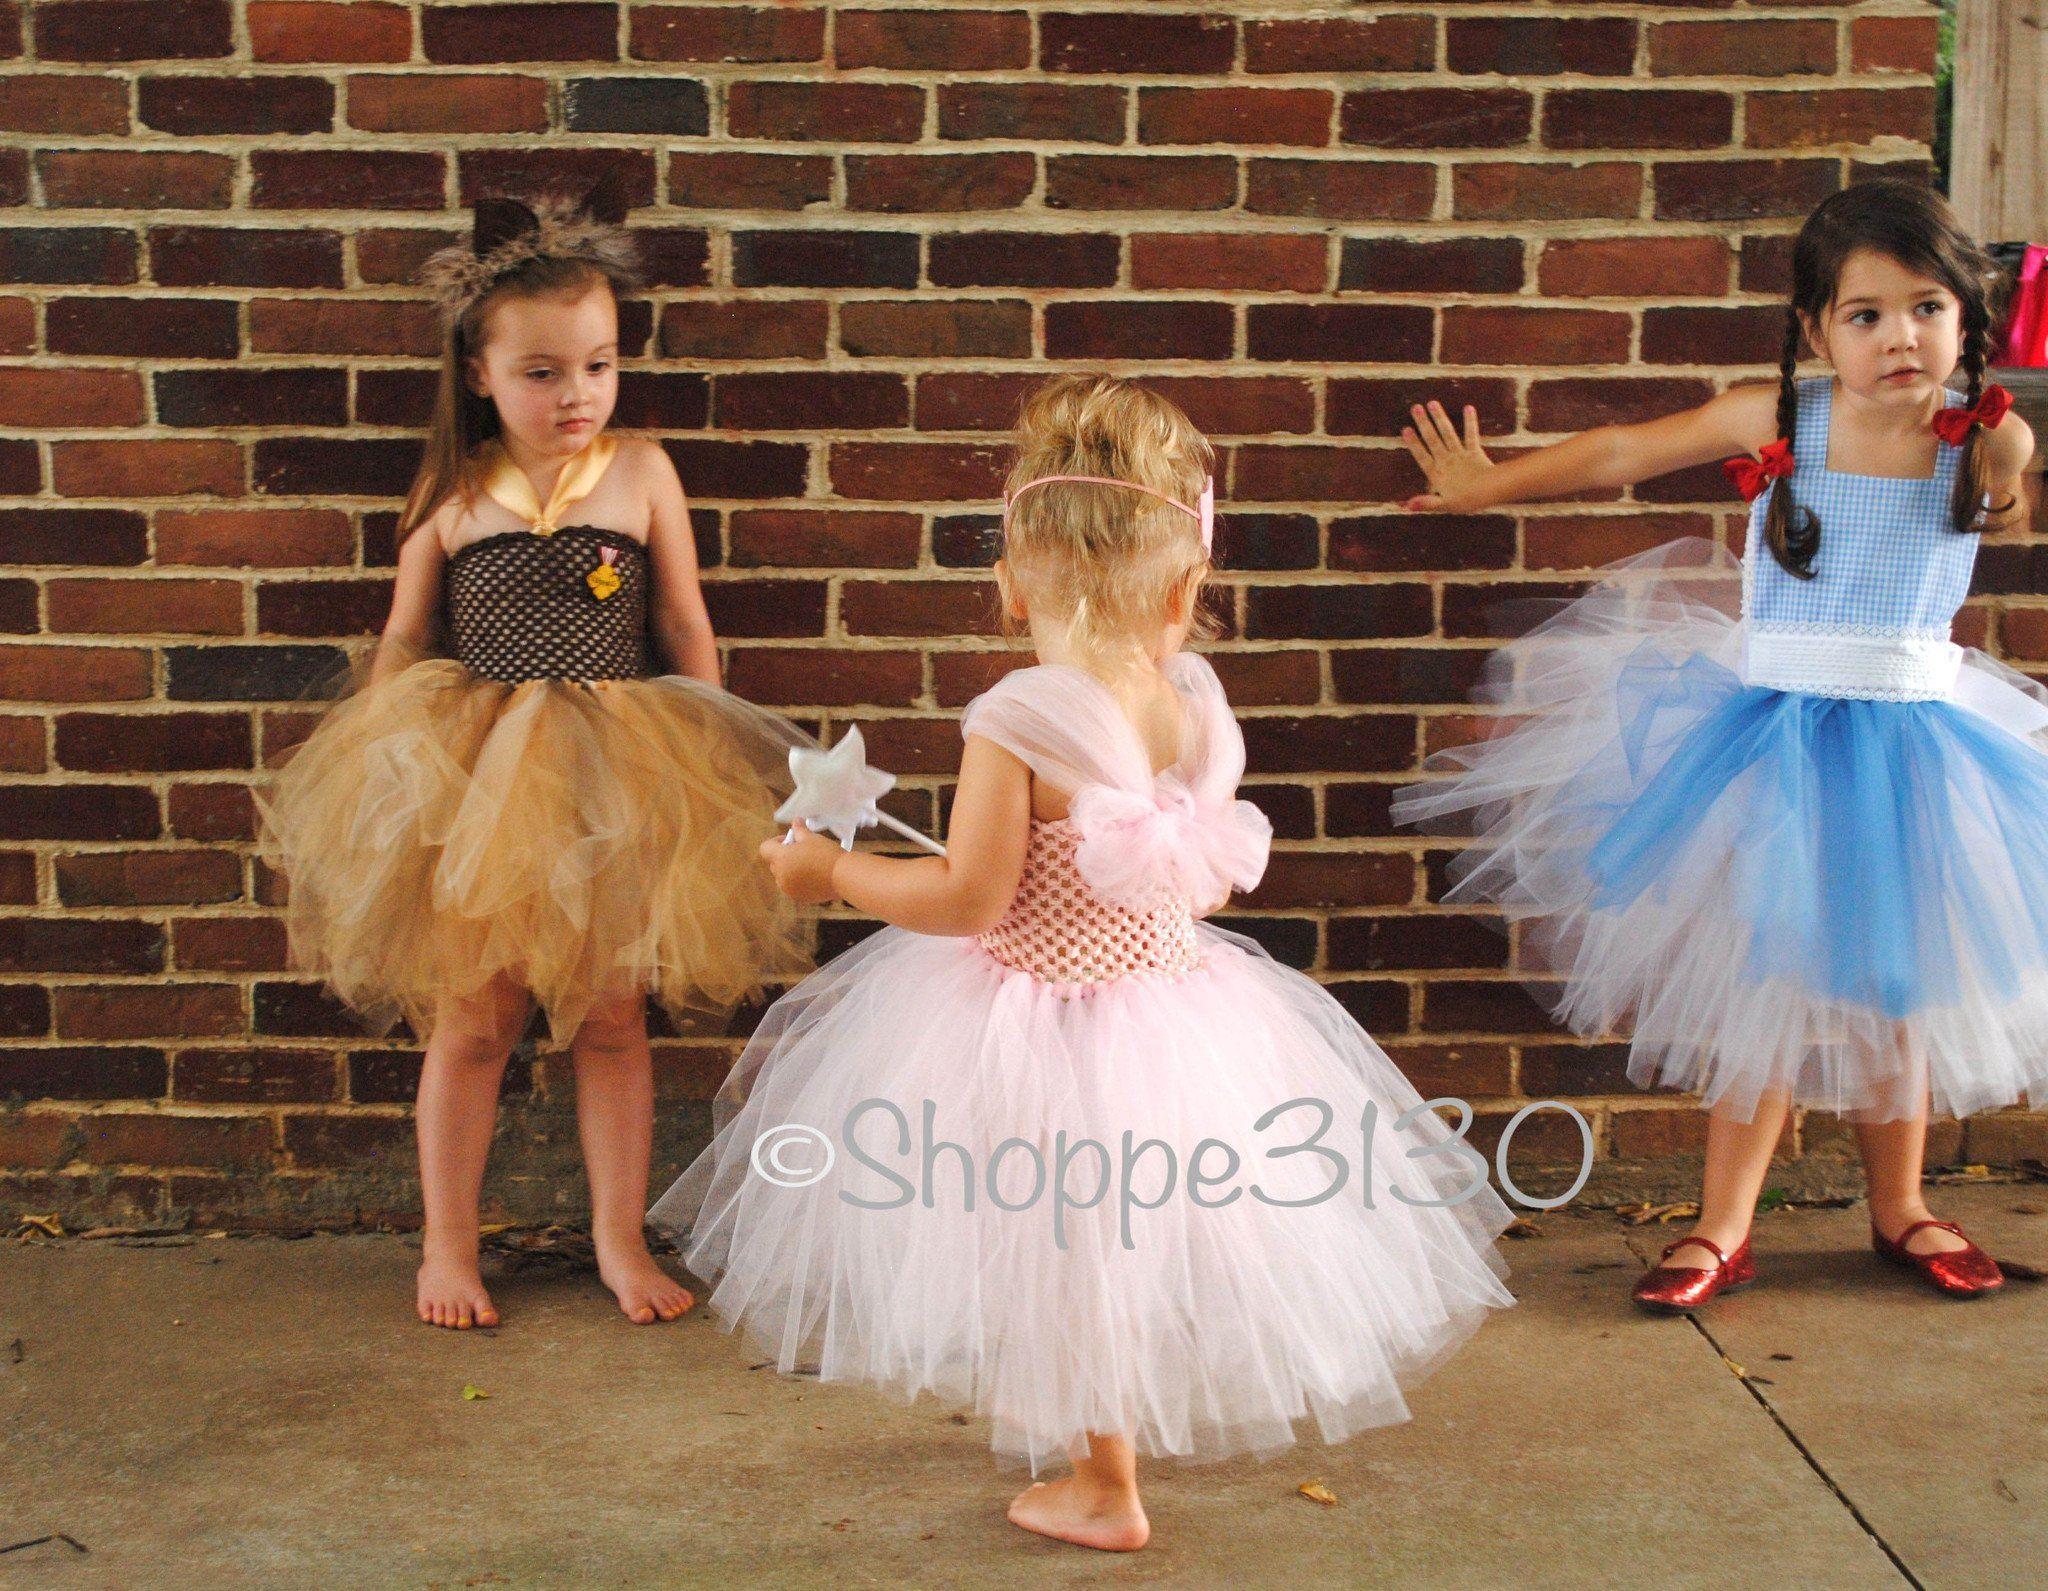 55e9c184da19 Wizard of Oz Inspired Tutu Dress Costume - Dorothy, Tin Man, Lion,  Scarecrow or Glenda